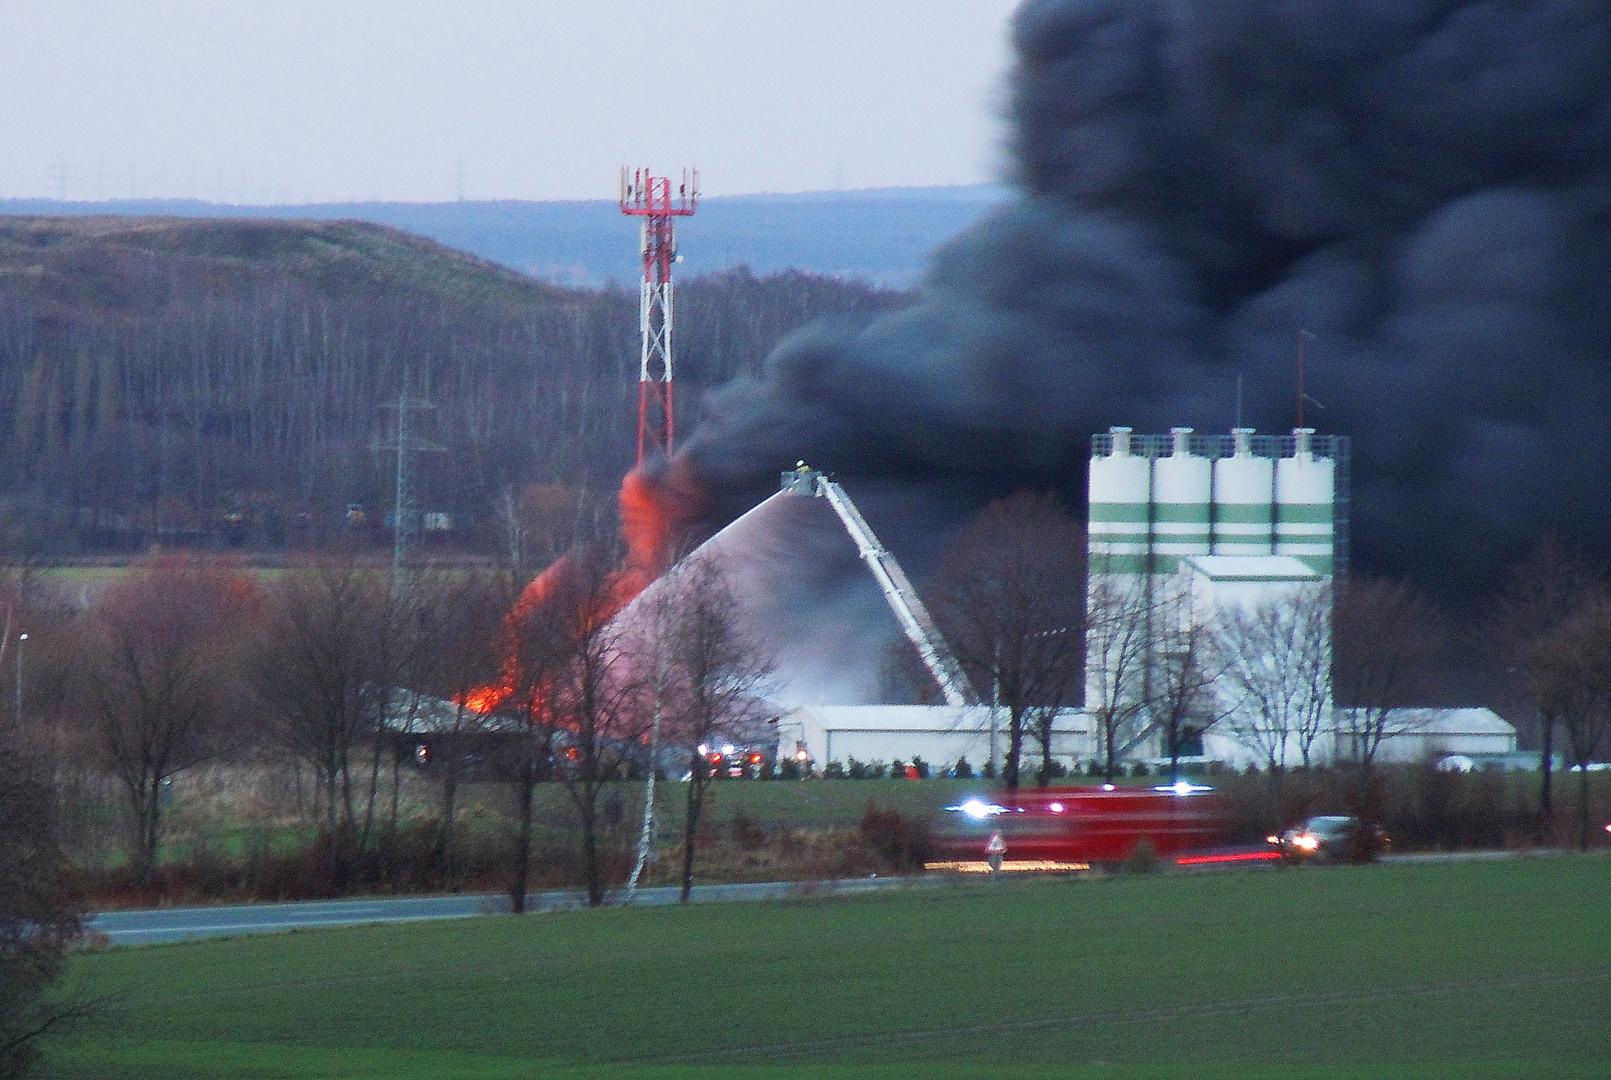 Grossbrand in Nienstädt 2